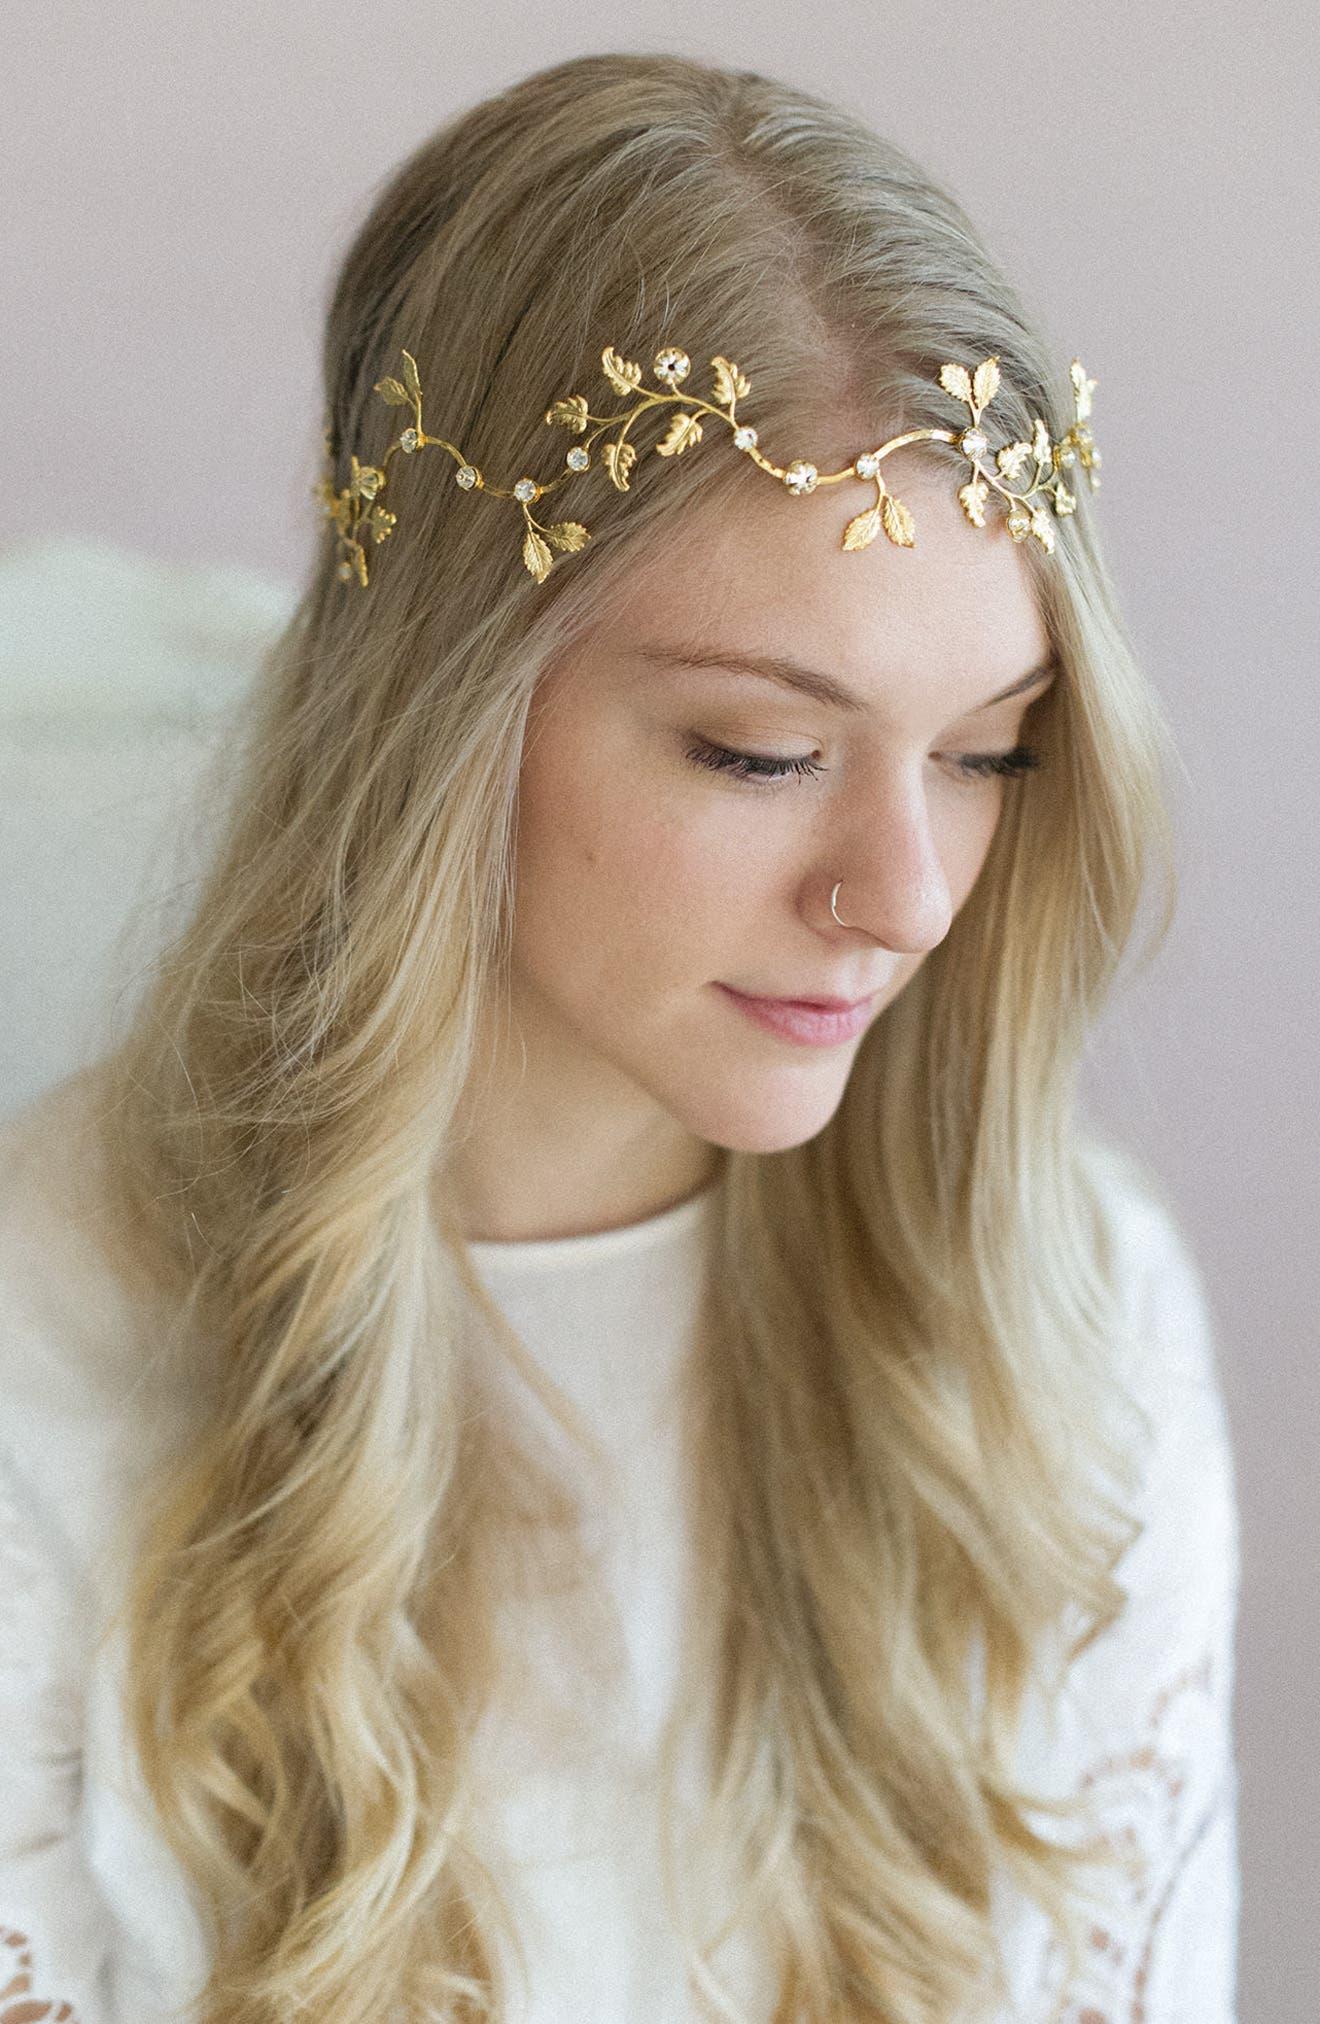 Alternate Image 1 Selected - twigs & honey Dainty Gilded Leaf Headband